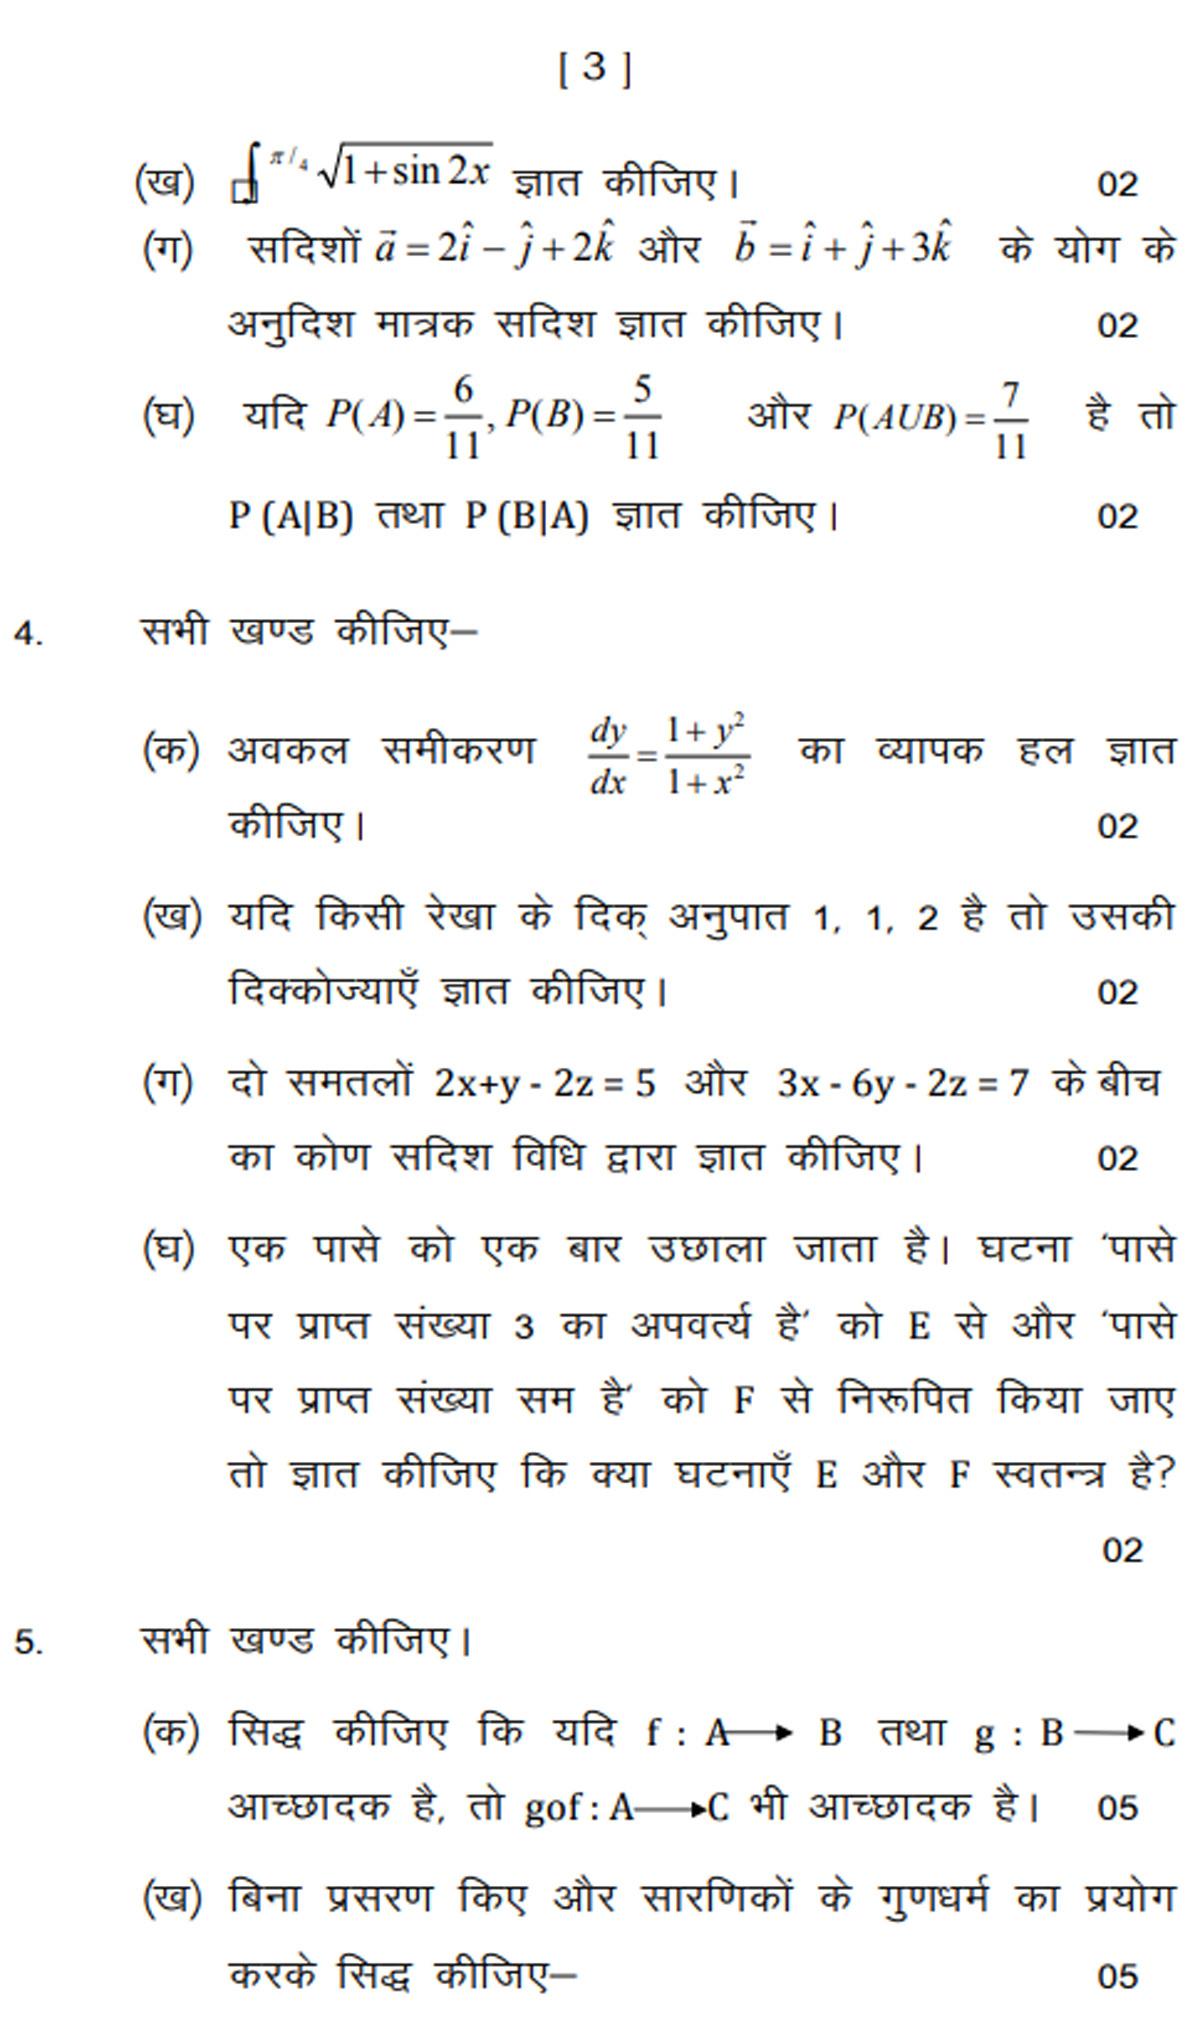 3. UP Board Class 12th Maths Model Test Paper